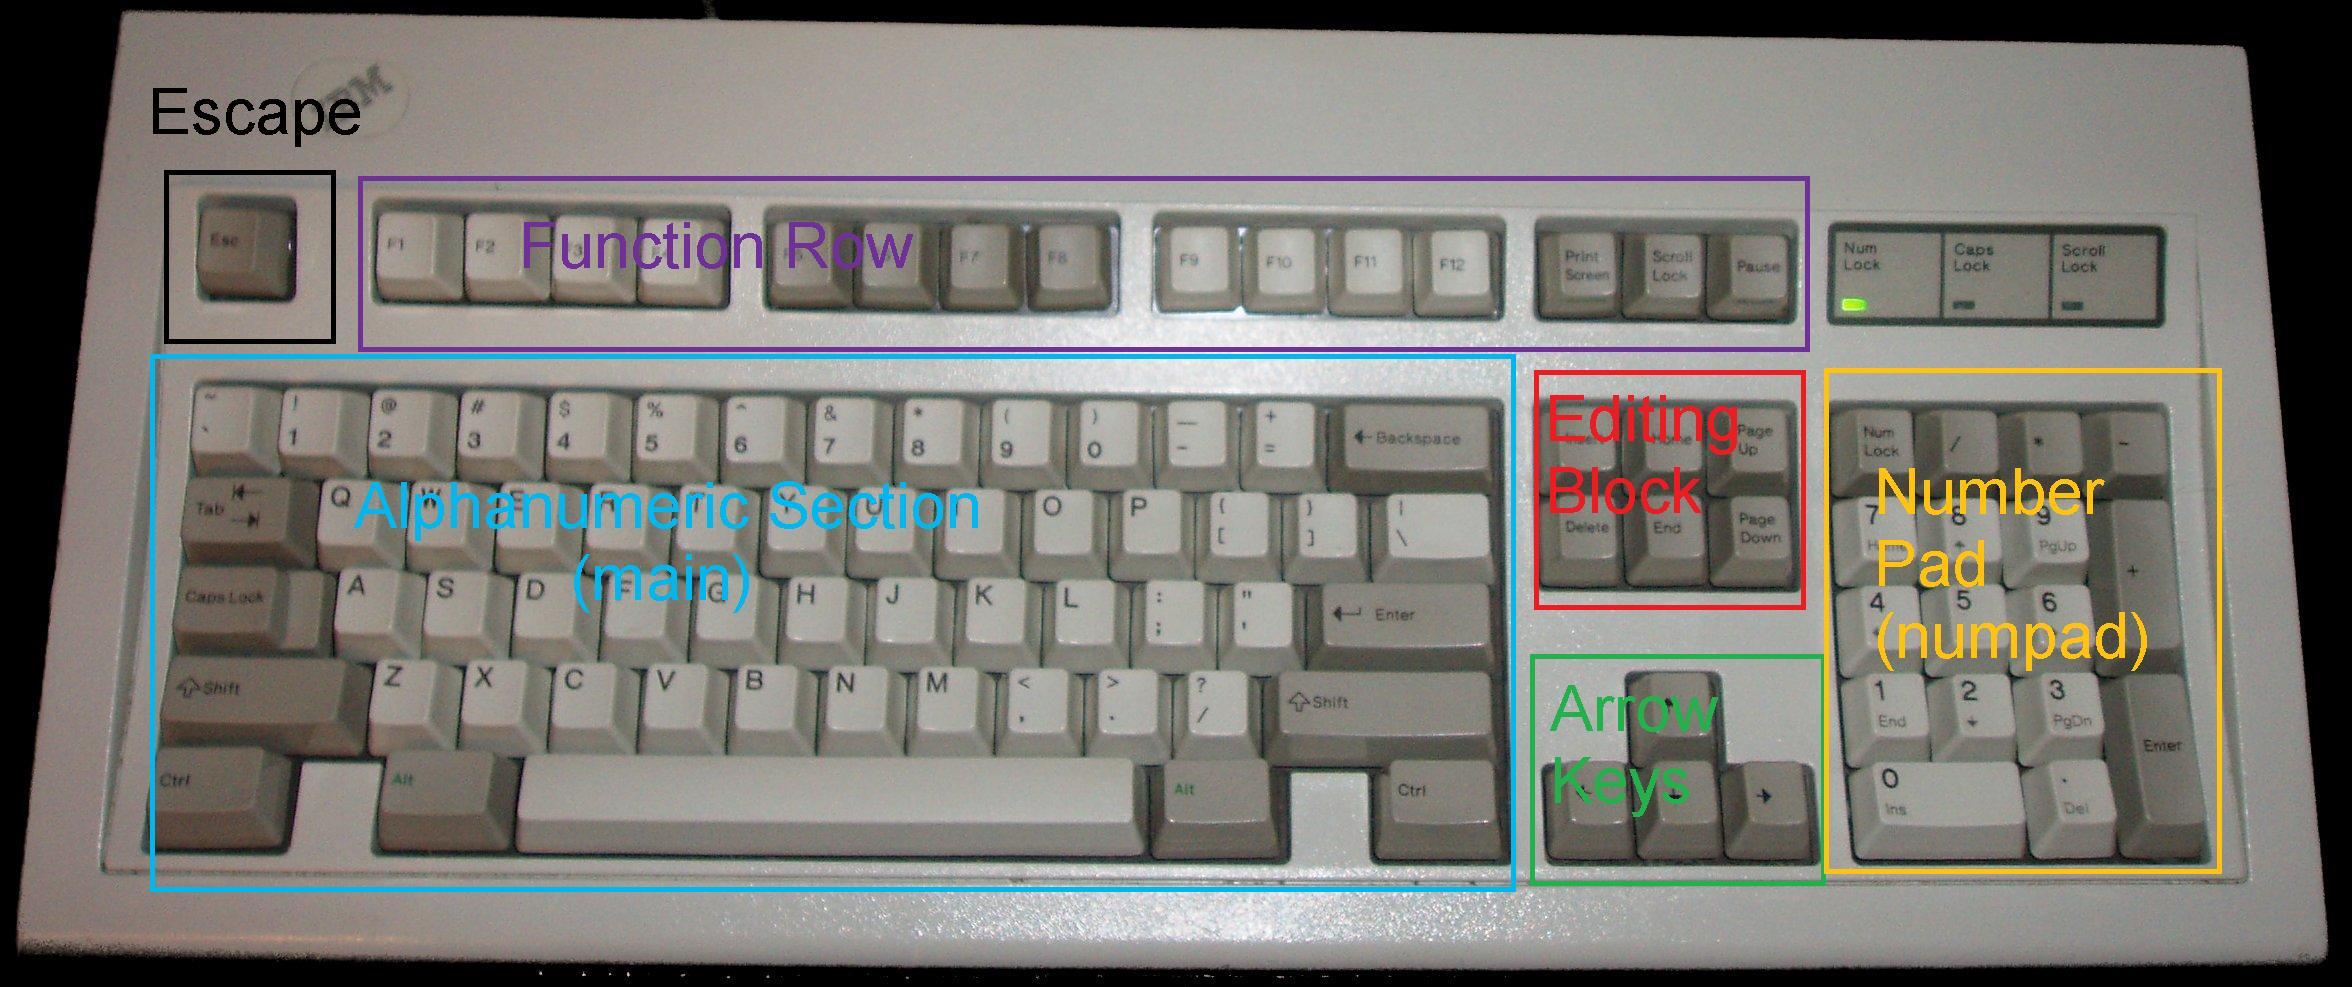 keyboard_labeled_by_phaedrus2401-d2yv8b7.jpg